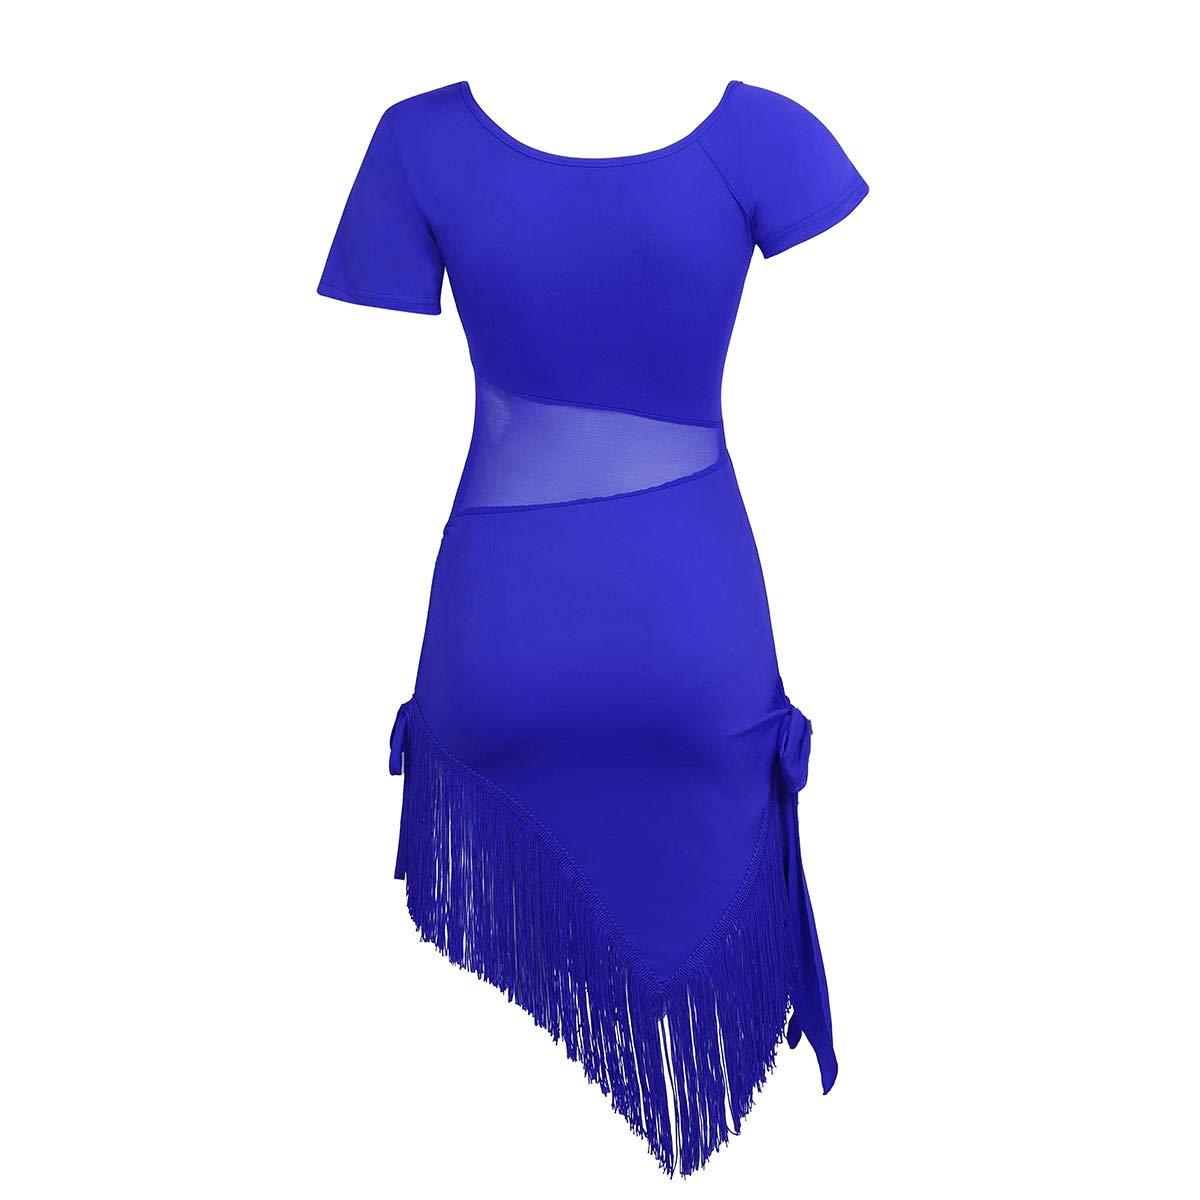 iEFiEL Women Mesh Splice Fringe Tassel Dress Recital Salsa Latin Tango Dance Stage Performance Costumes